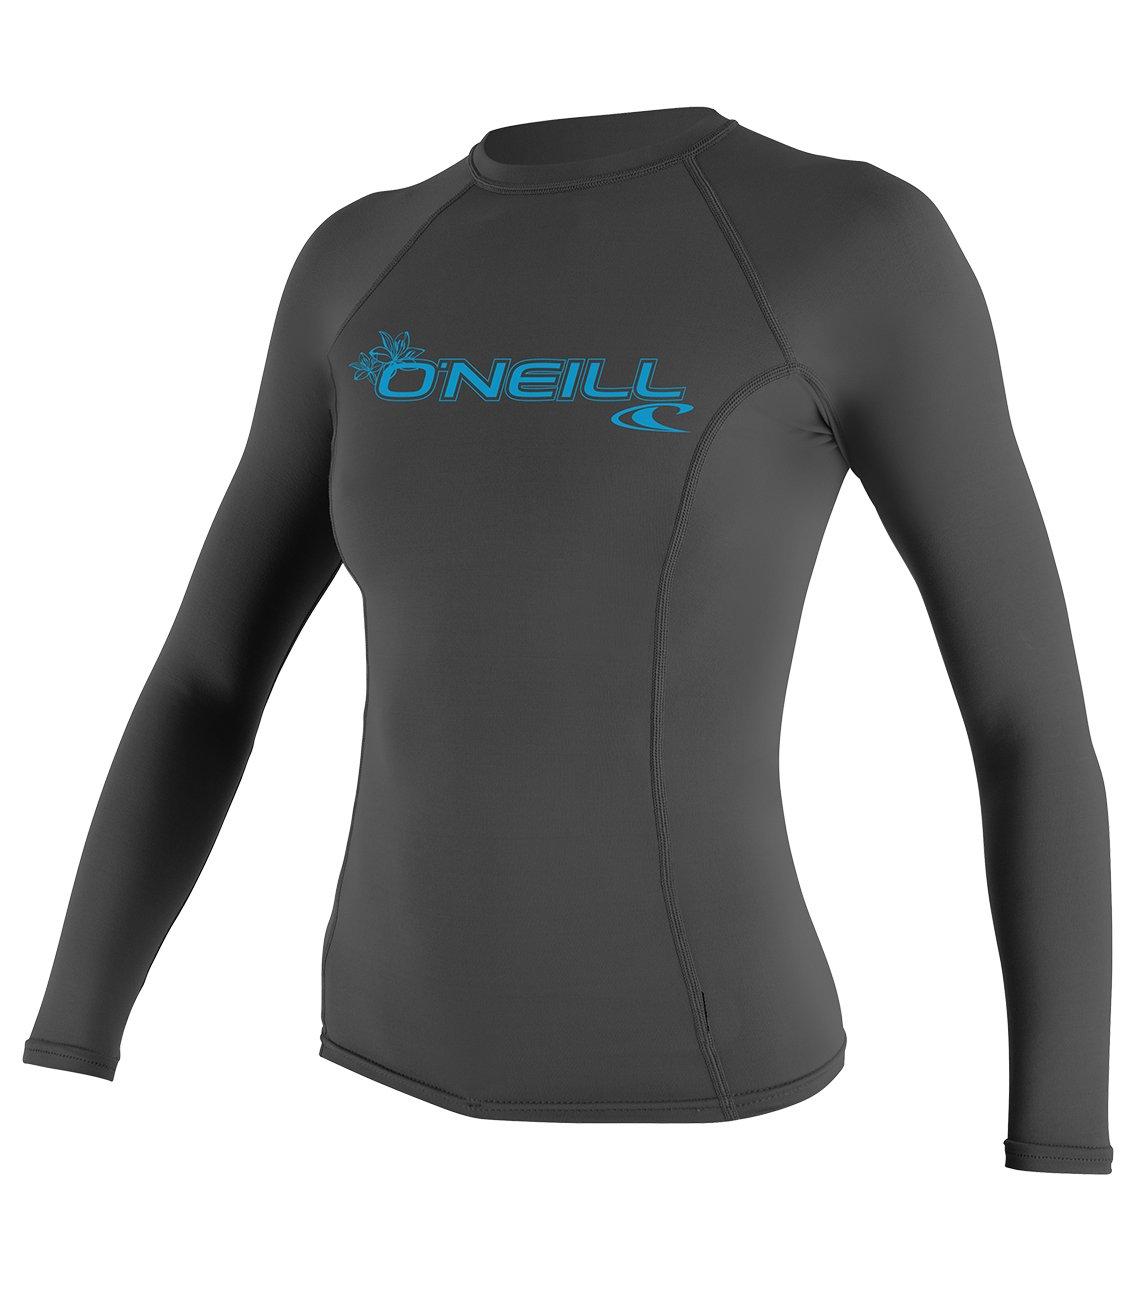 O'Neill Wetsuits Women's Basic Skins UPF 50+ Long